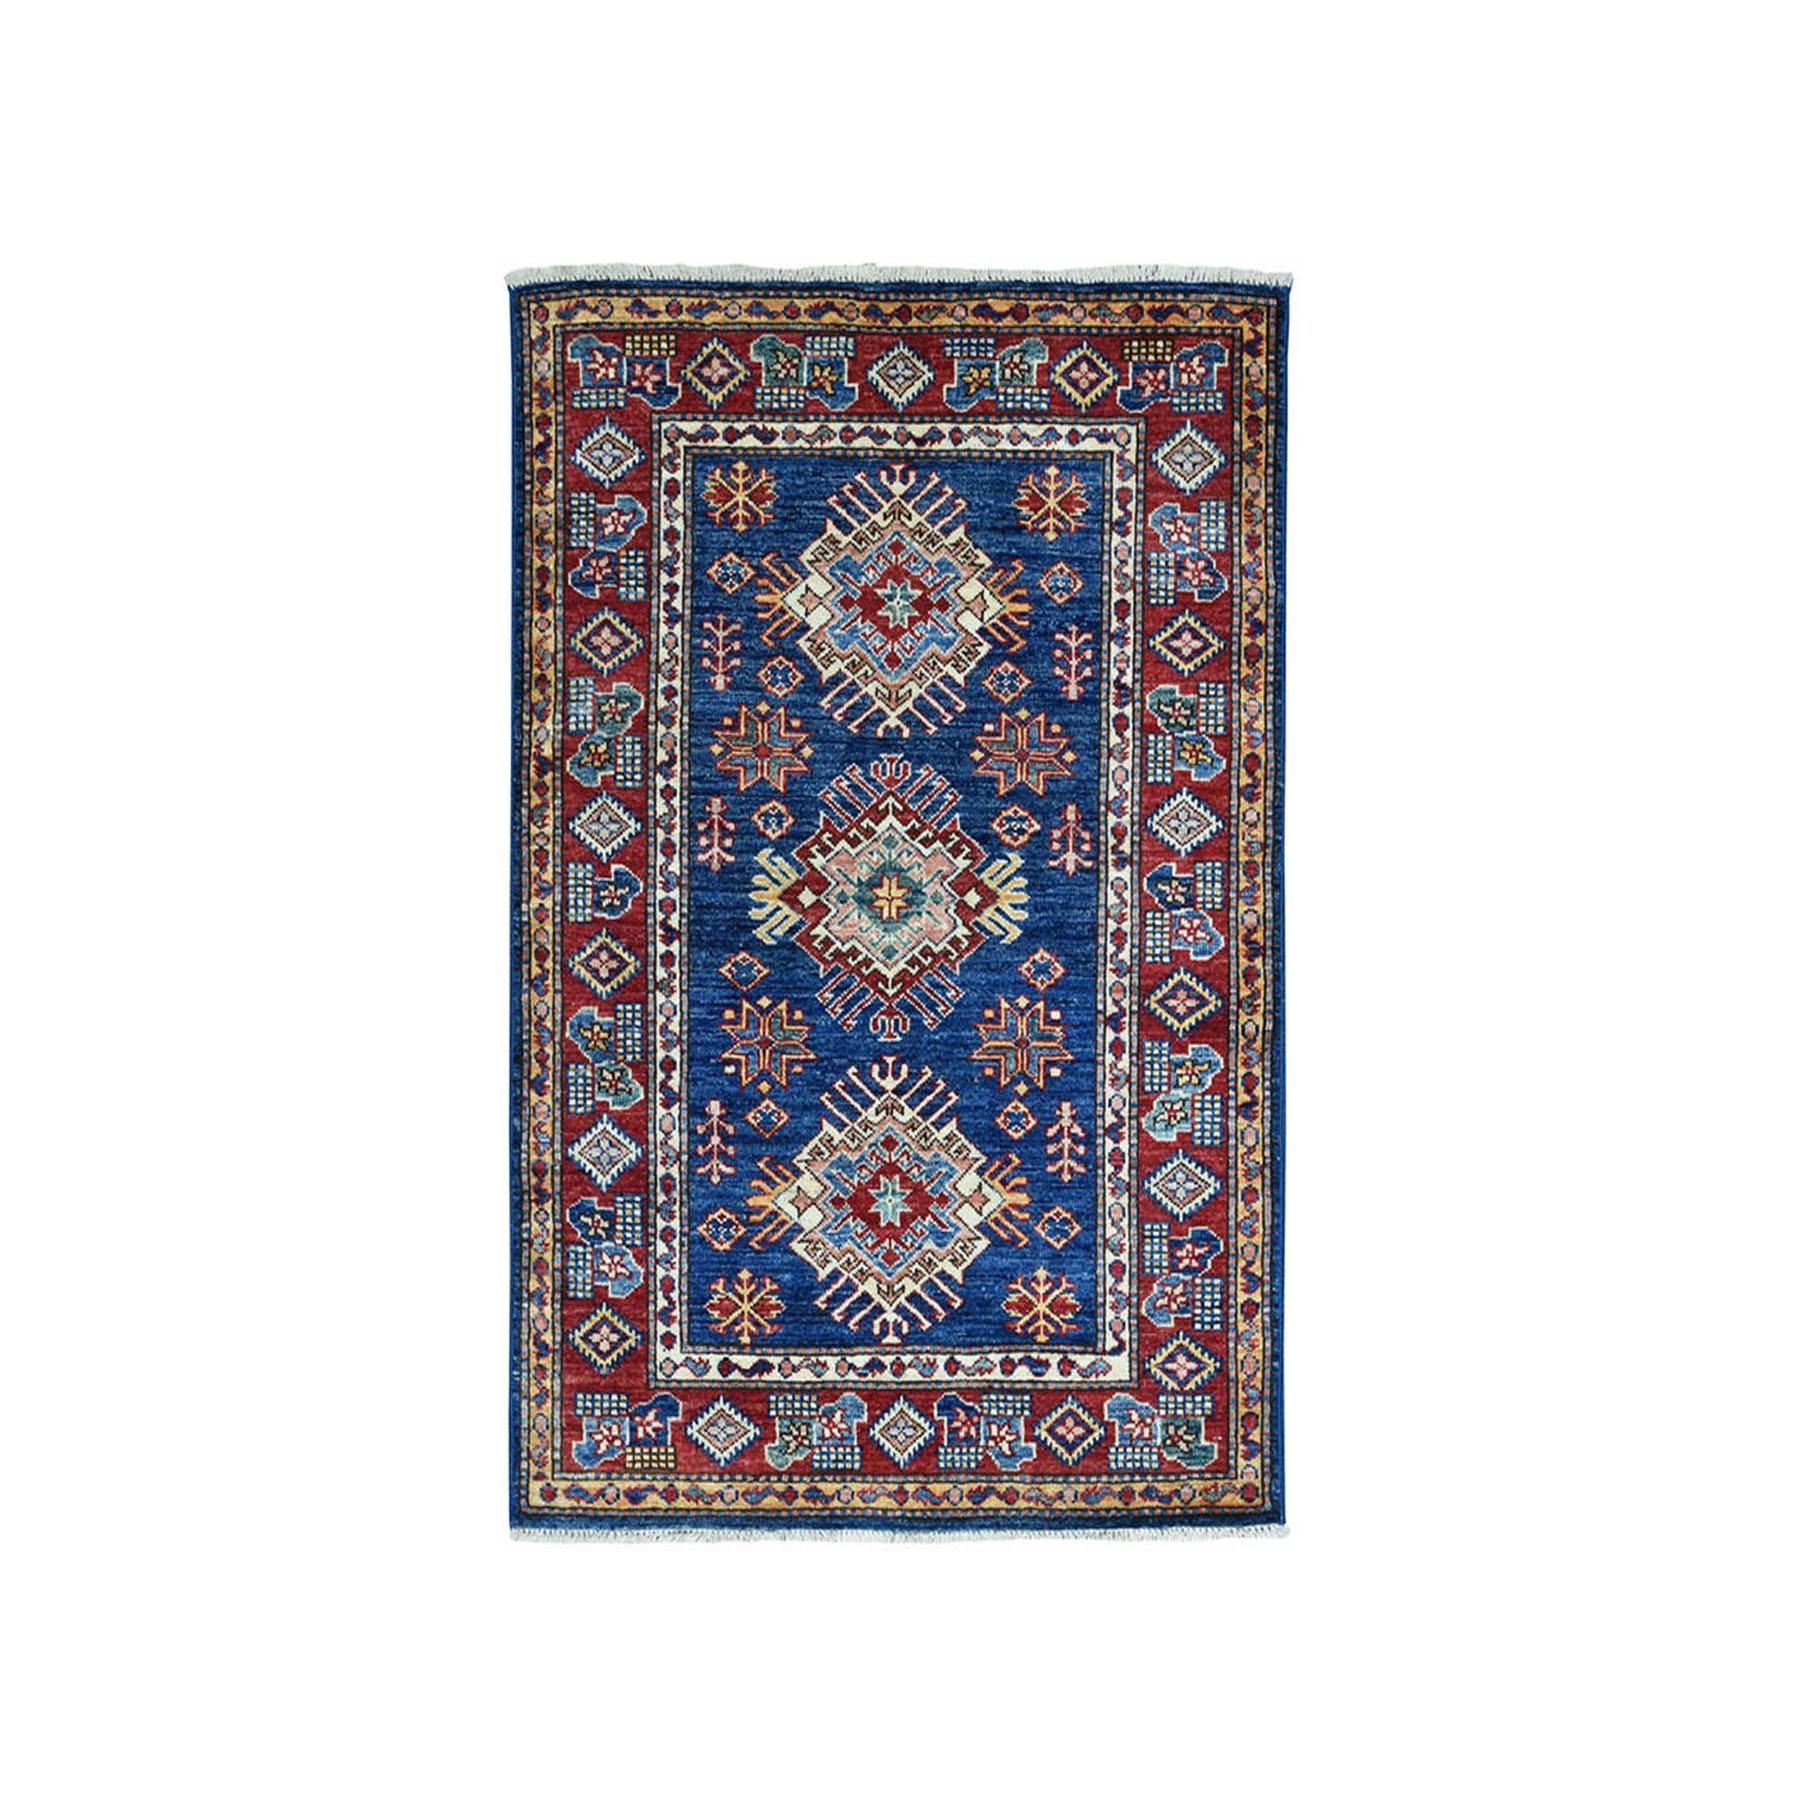 3'X4' Blue Super Kazak Pure Wool Geometric Design Hand-Knotted Oriental Rug moae09c8